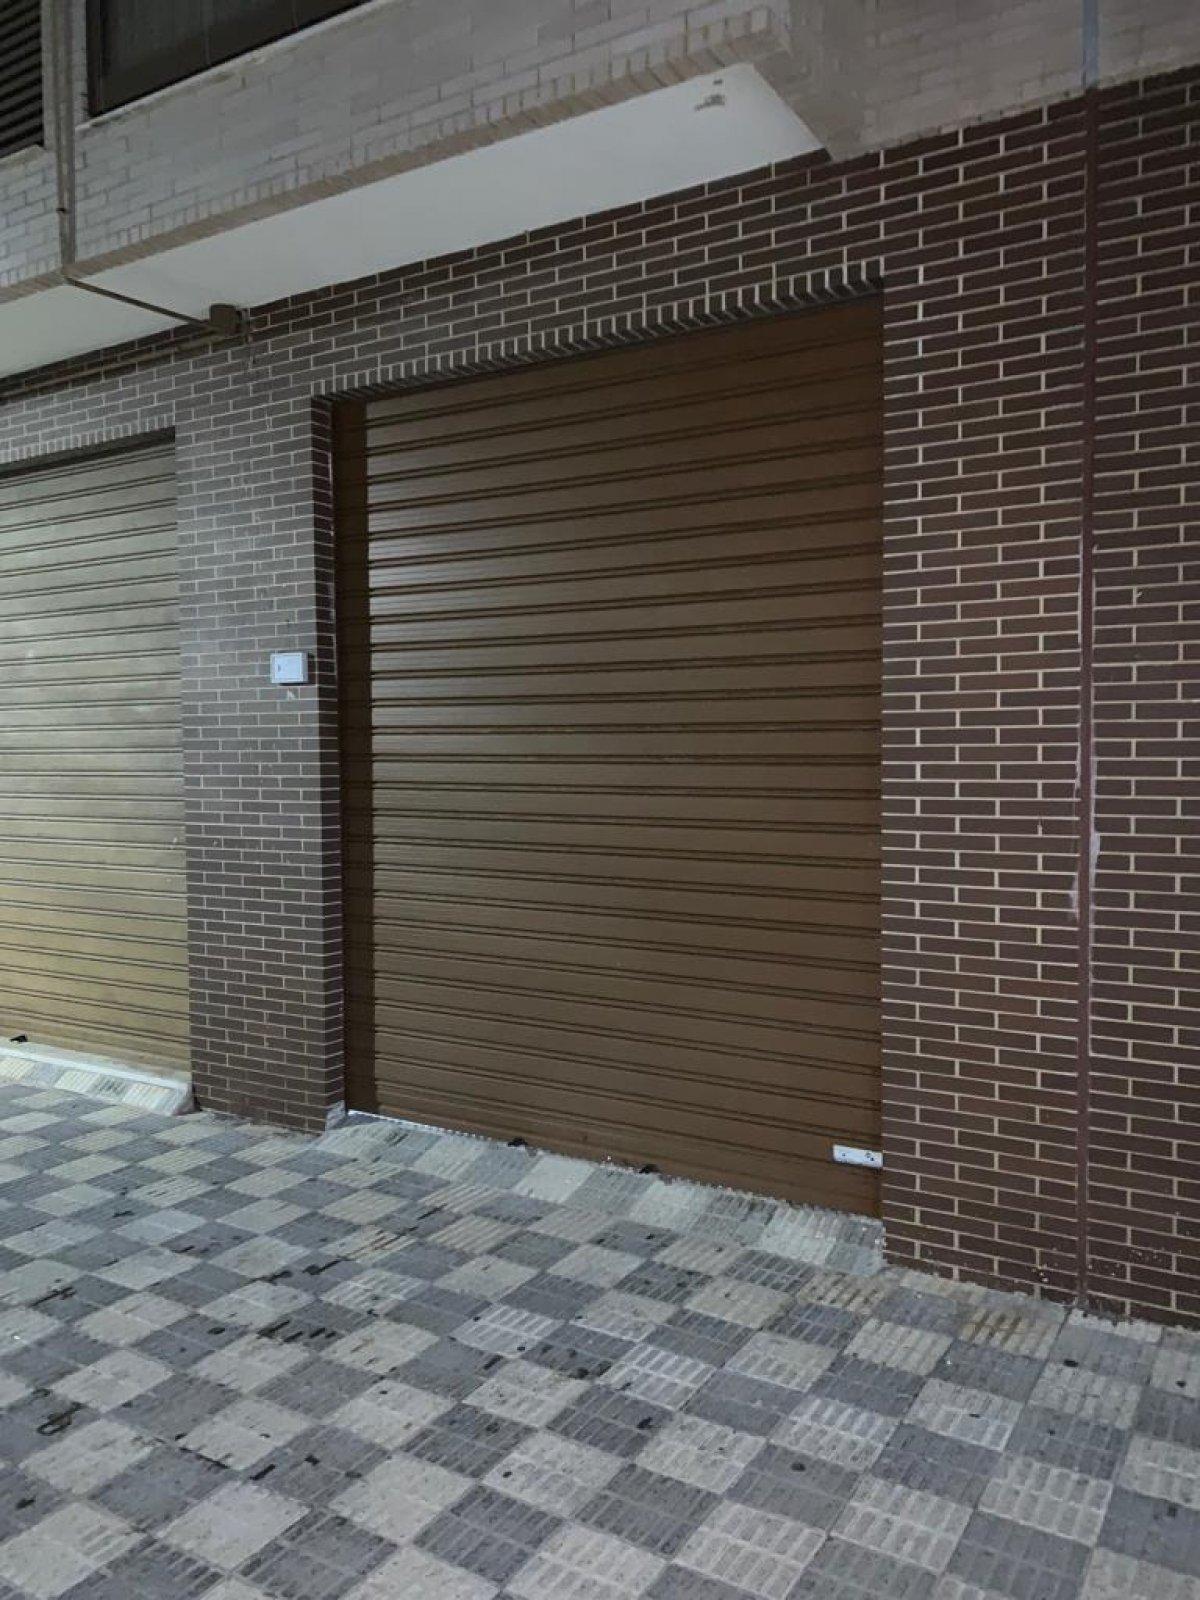 Lloguer Local Comercial  Alcasser ,46290 alcasser. Local ideal garaje y trastero